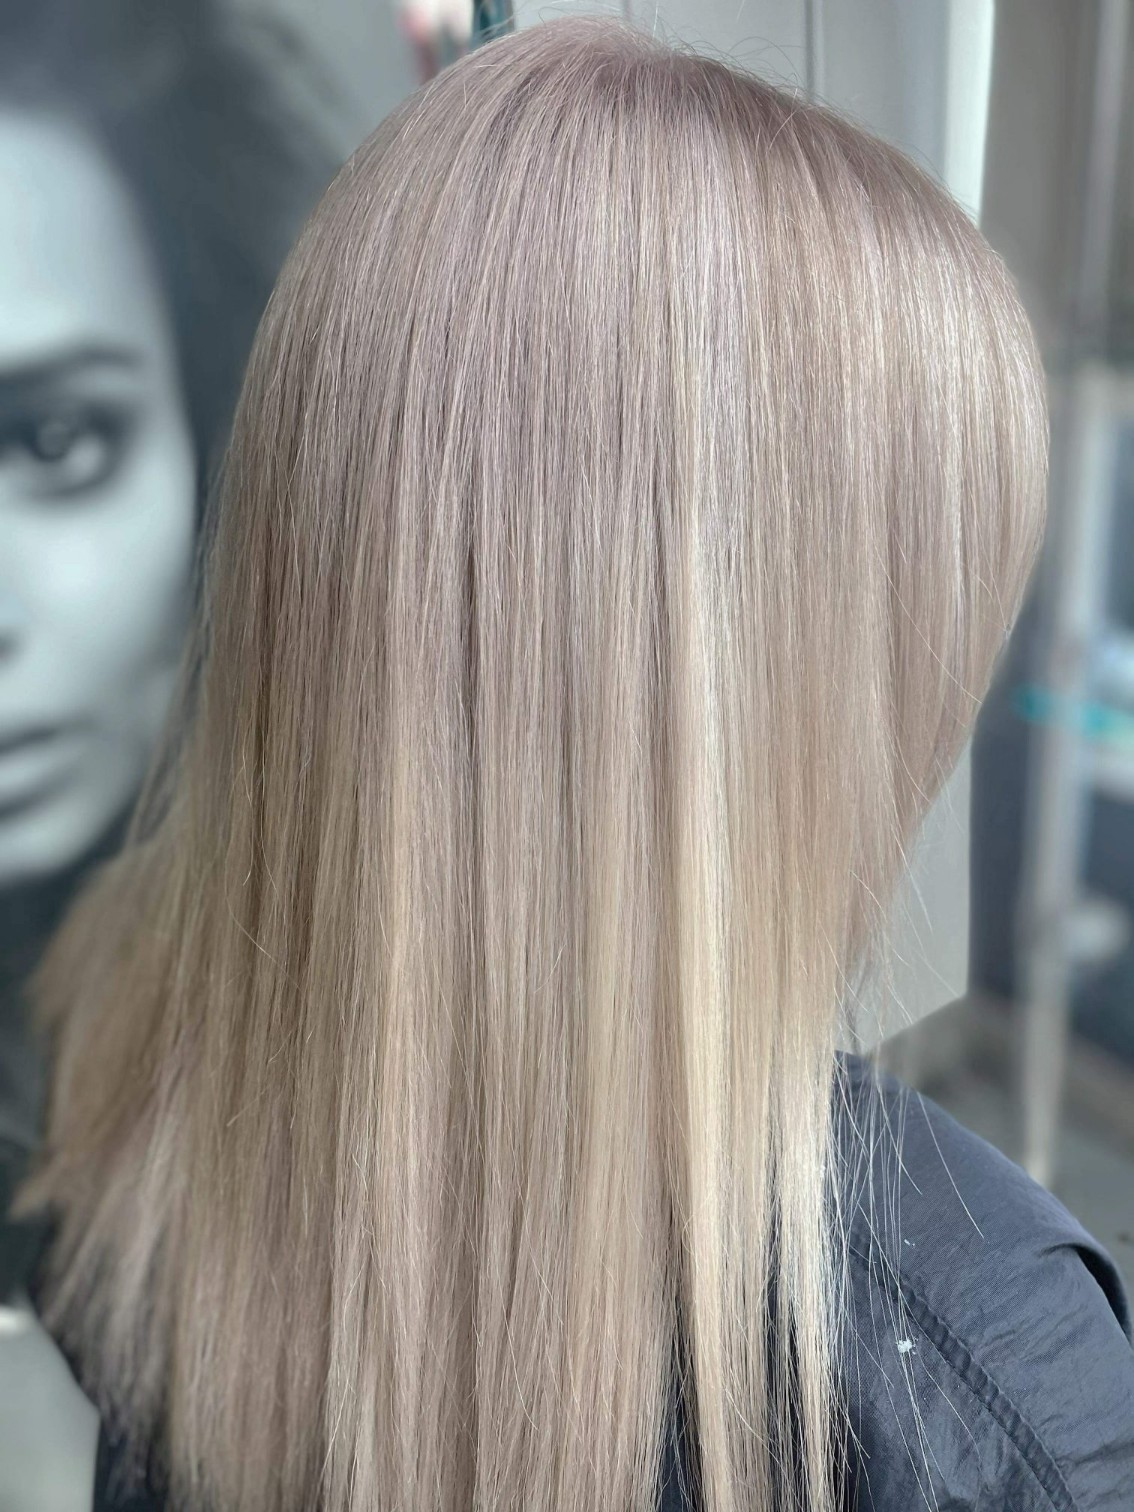 Ania Hair Salon_ long blonde